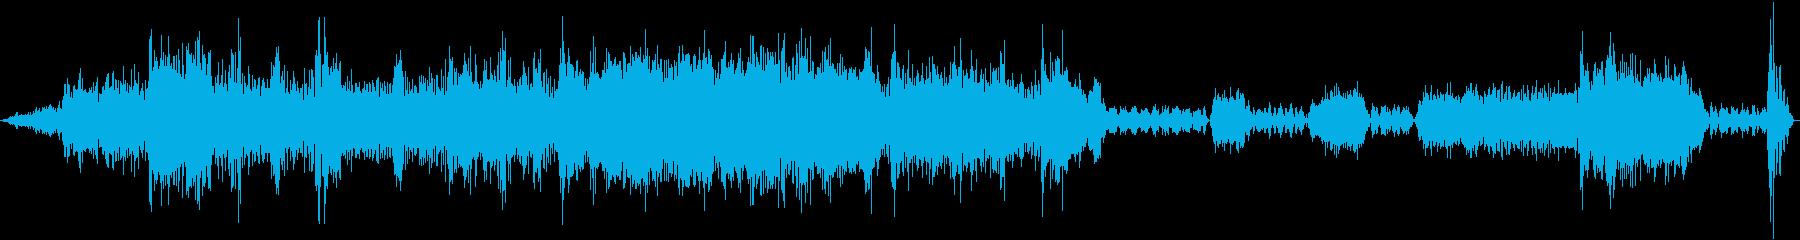 ROGUE ANDROID Wea...の再生済みの波形